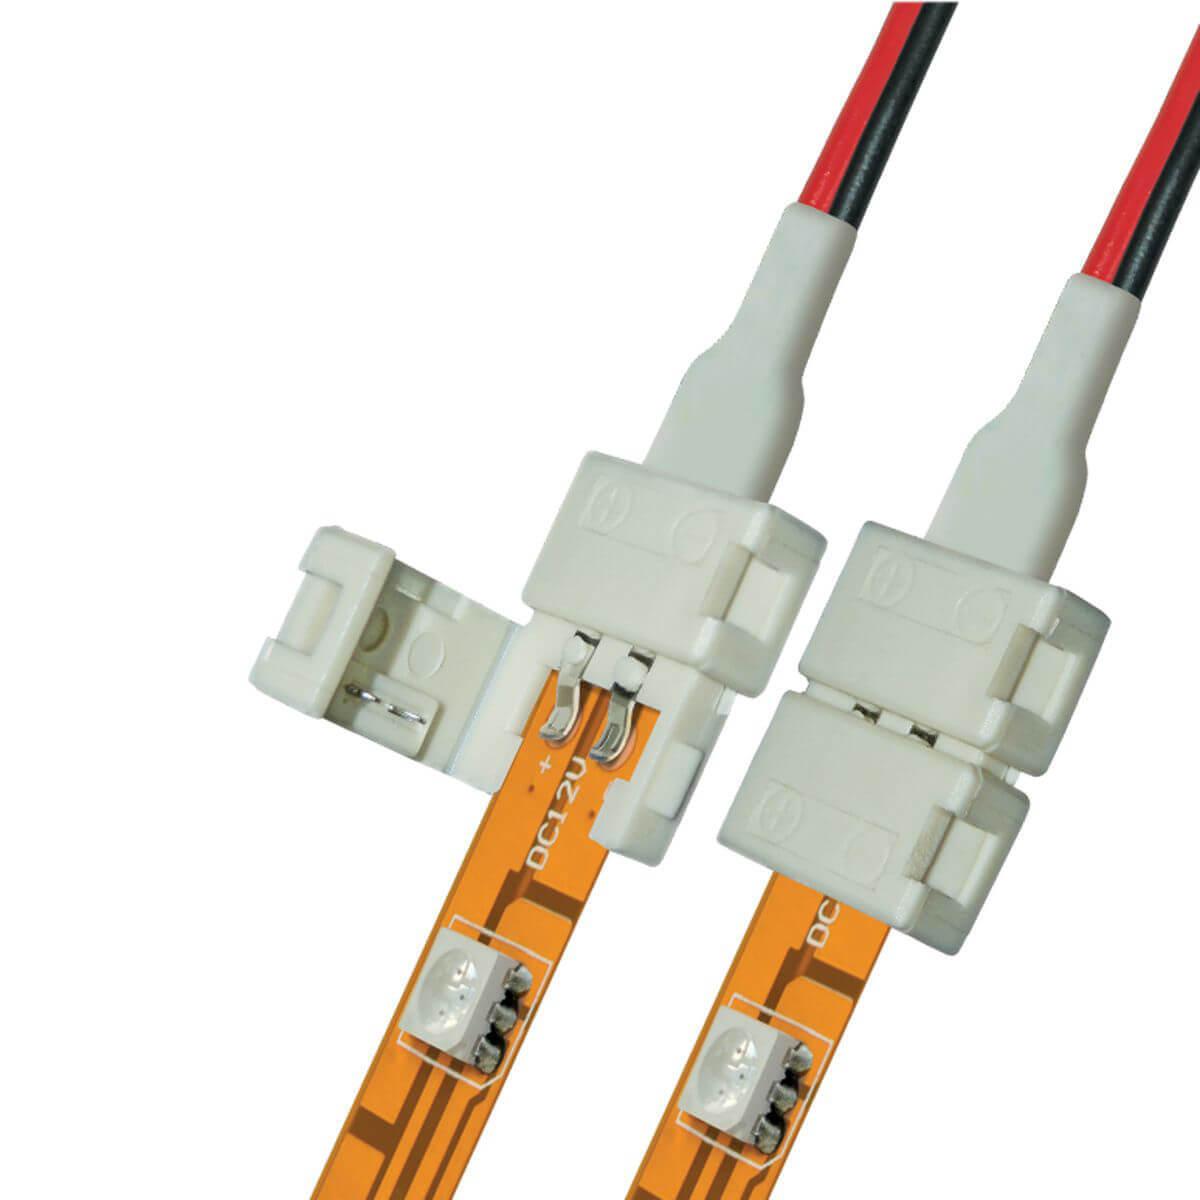 Коннектор для светодиодных лент (06609) Uniel UCX-SD2/B20-NNN White 020 цена и фото